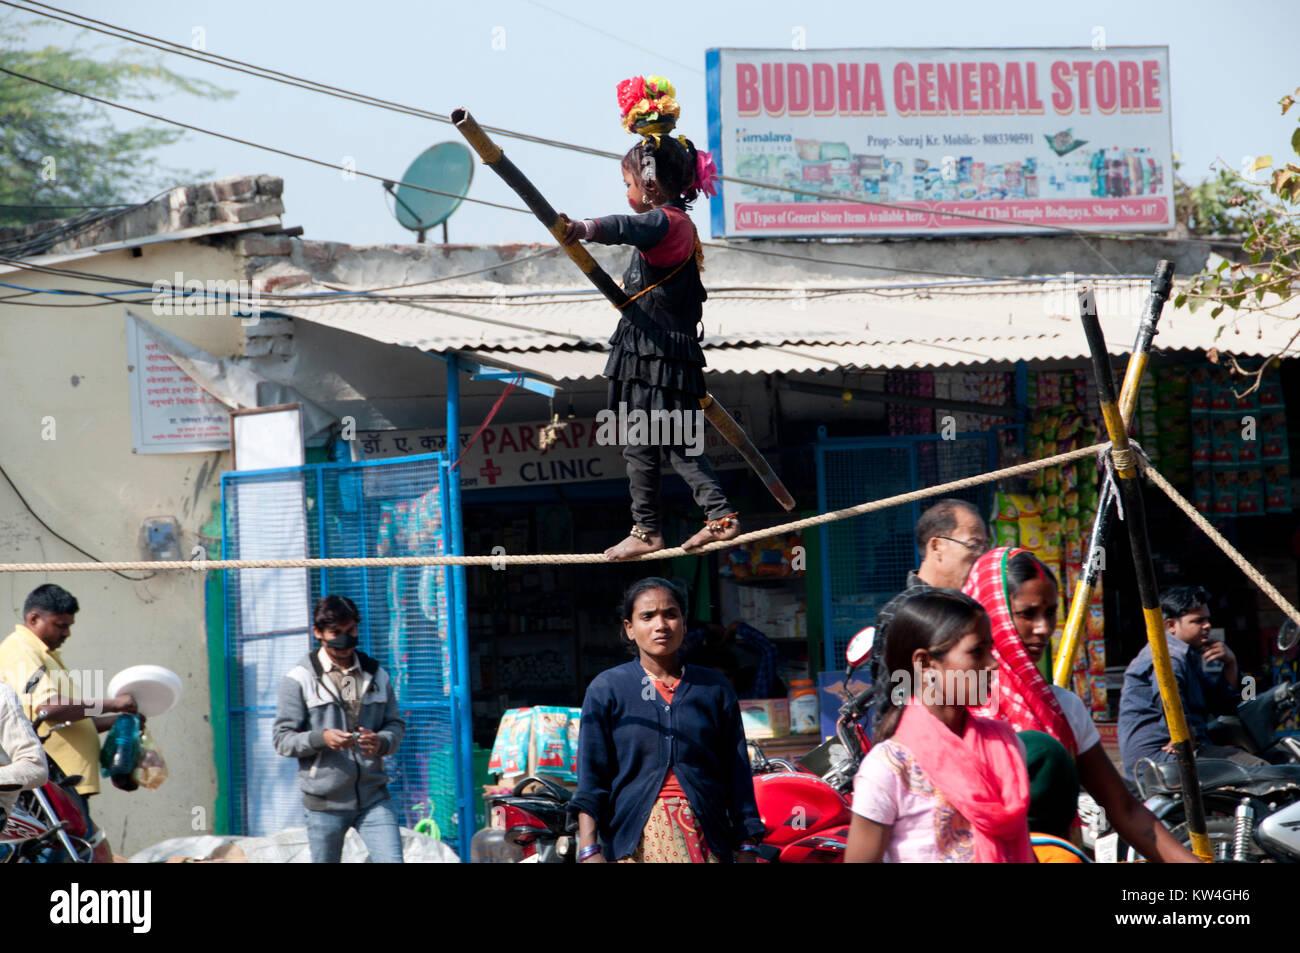 India. Bihar. Bodhgaya. A small girl performs on a tightrope. - Stock Image